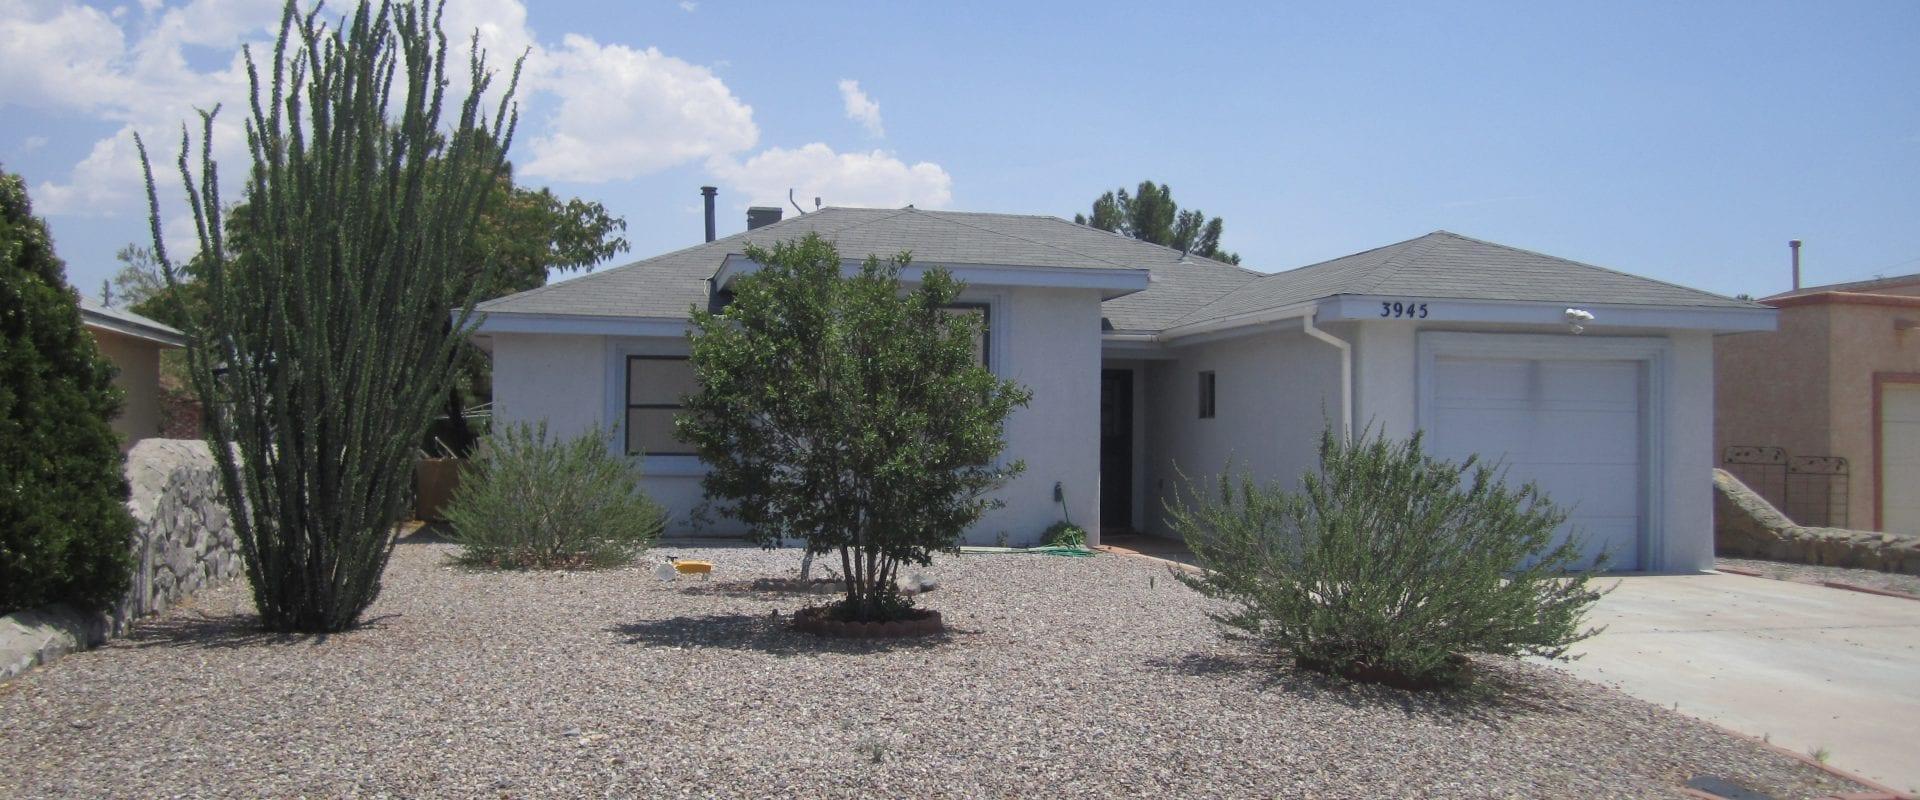 3945 Crystal Ct., Las Cruces, NM 88012